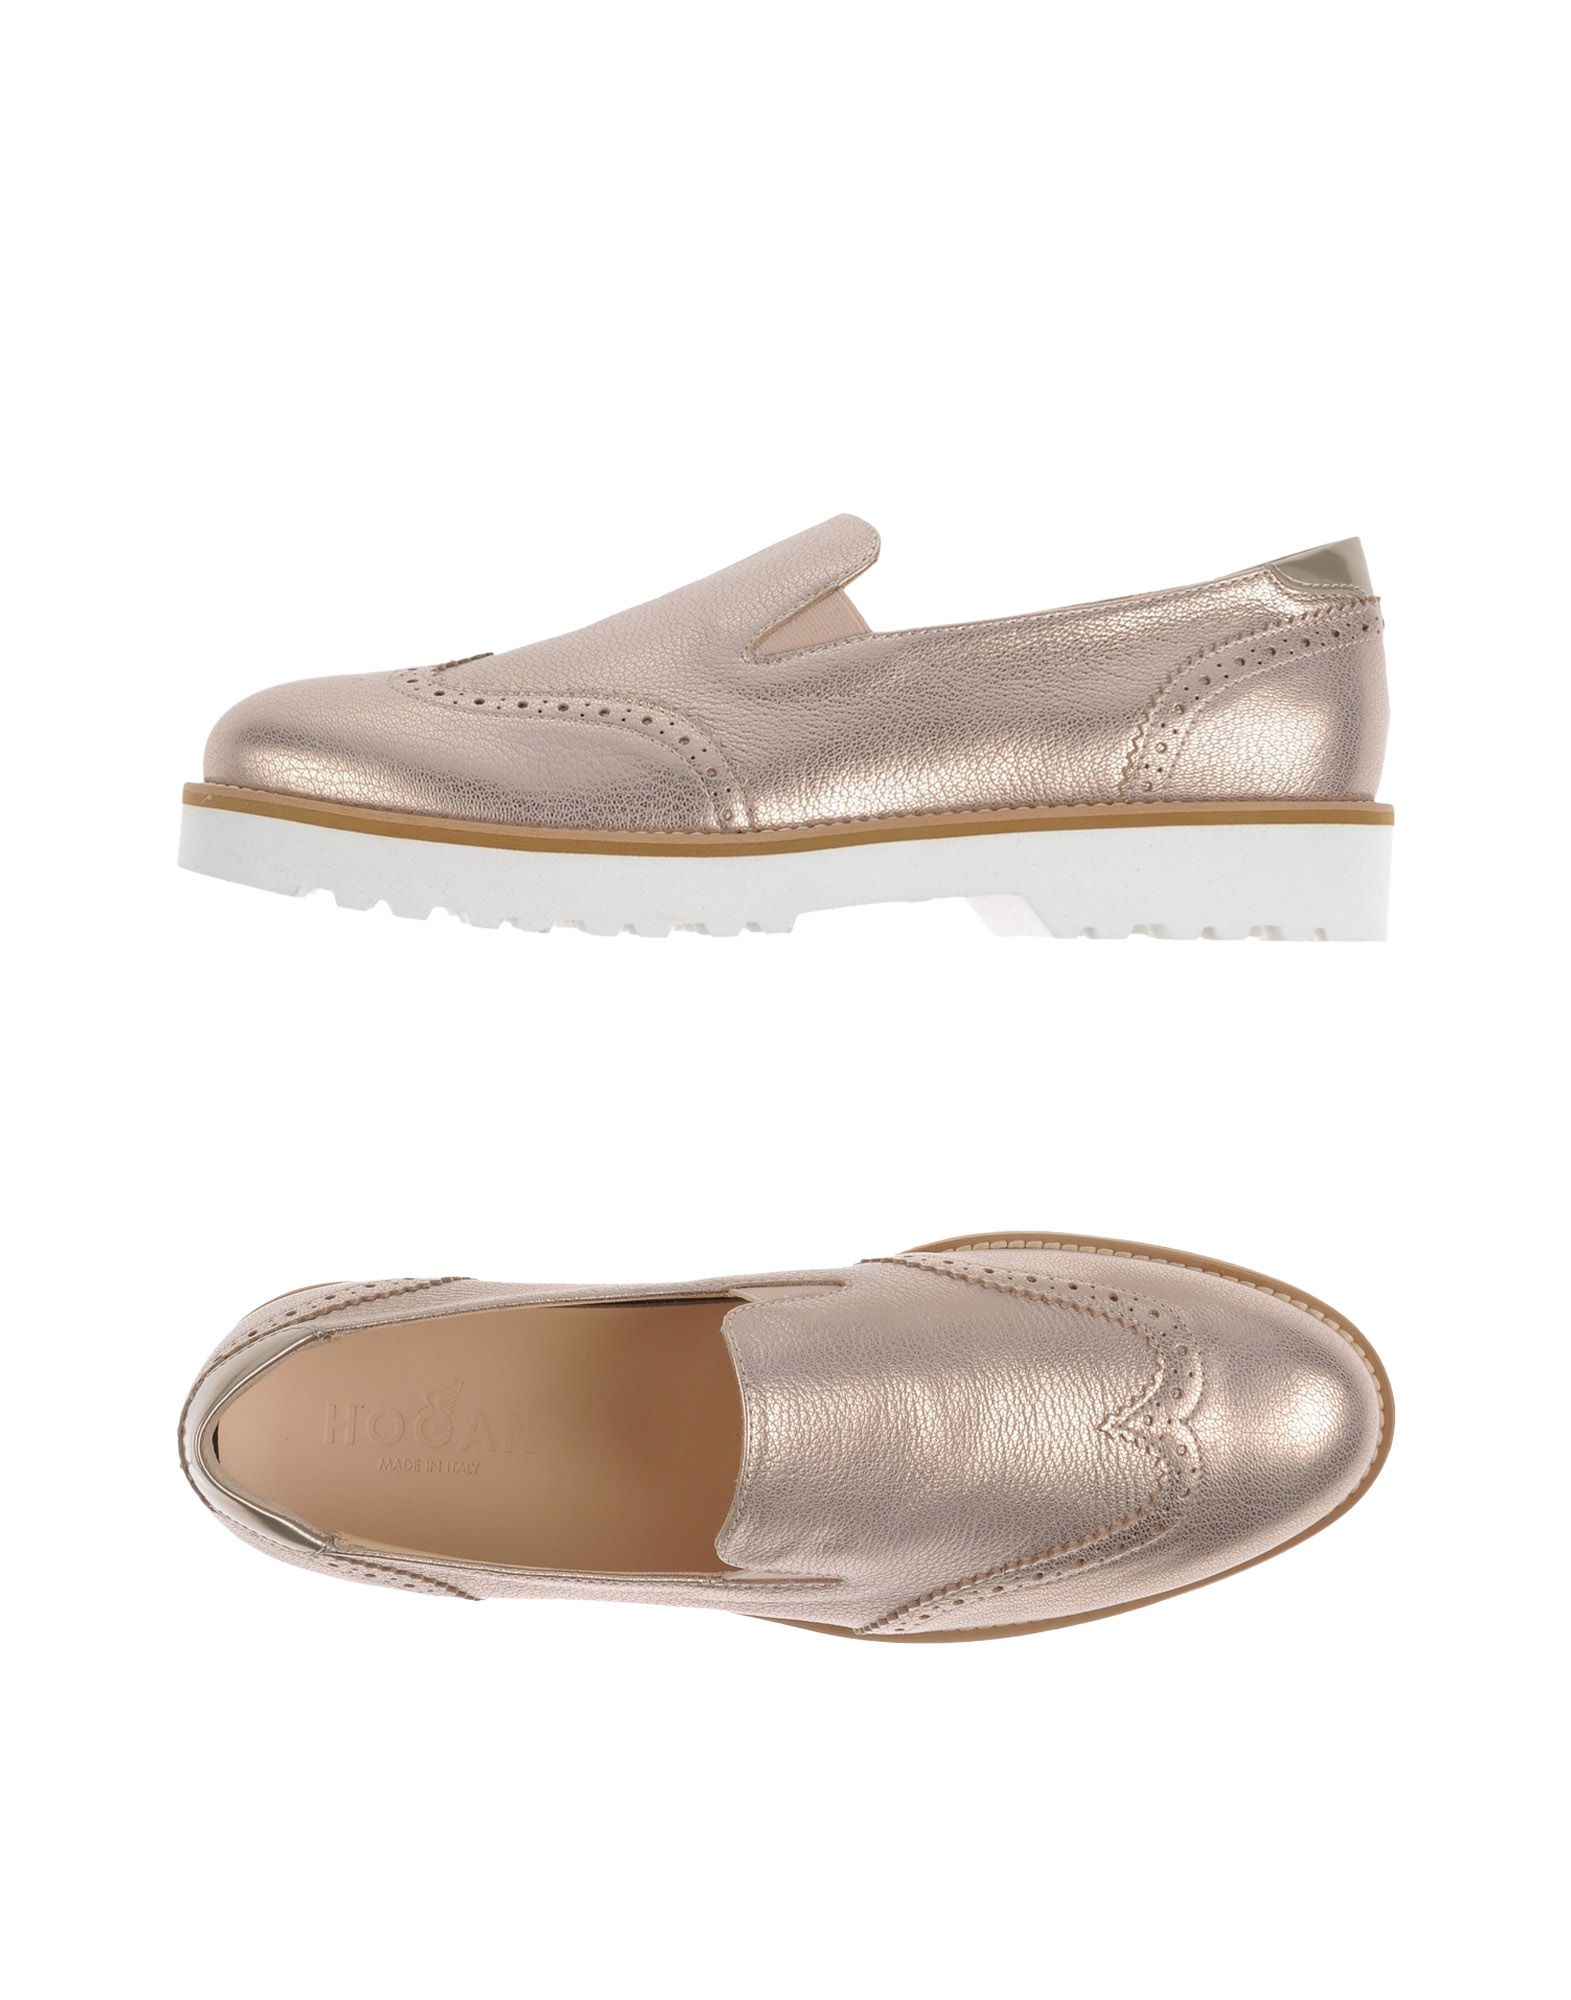 Hogan Mokassins Damen  11178266HEGut aussehende strapazierfähige Schuhe